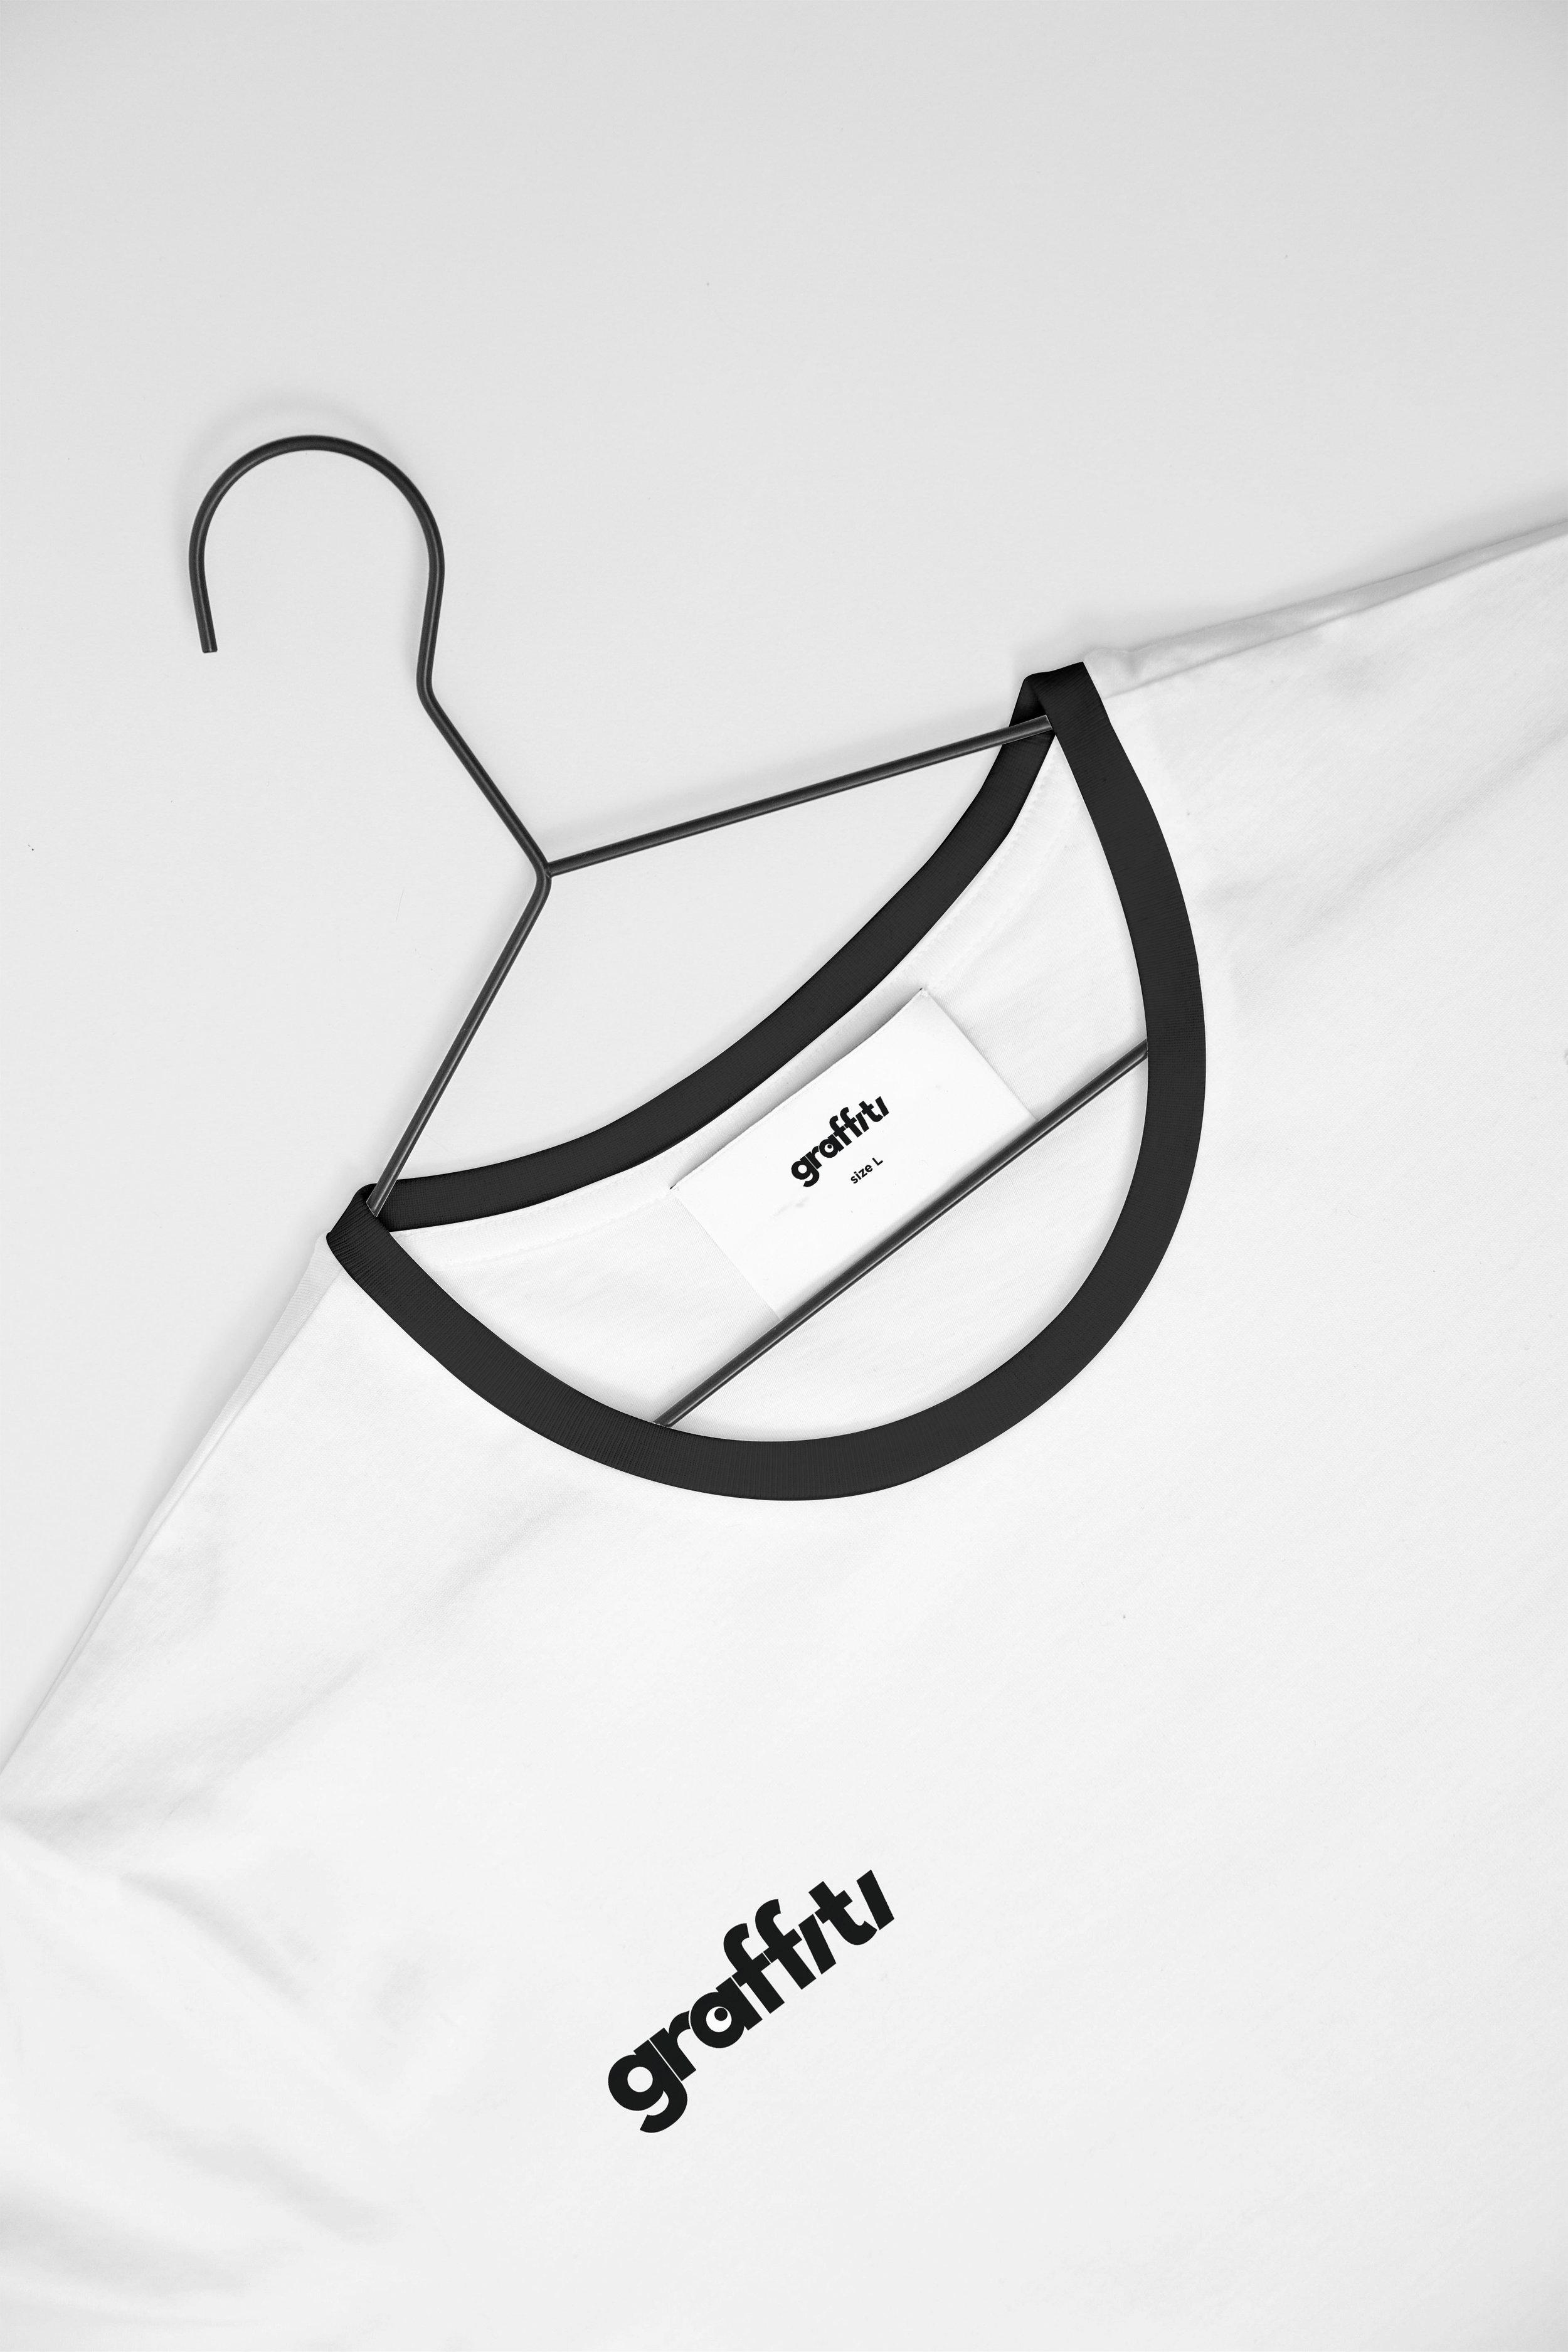 White T-Shirt Mockup.jpg